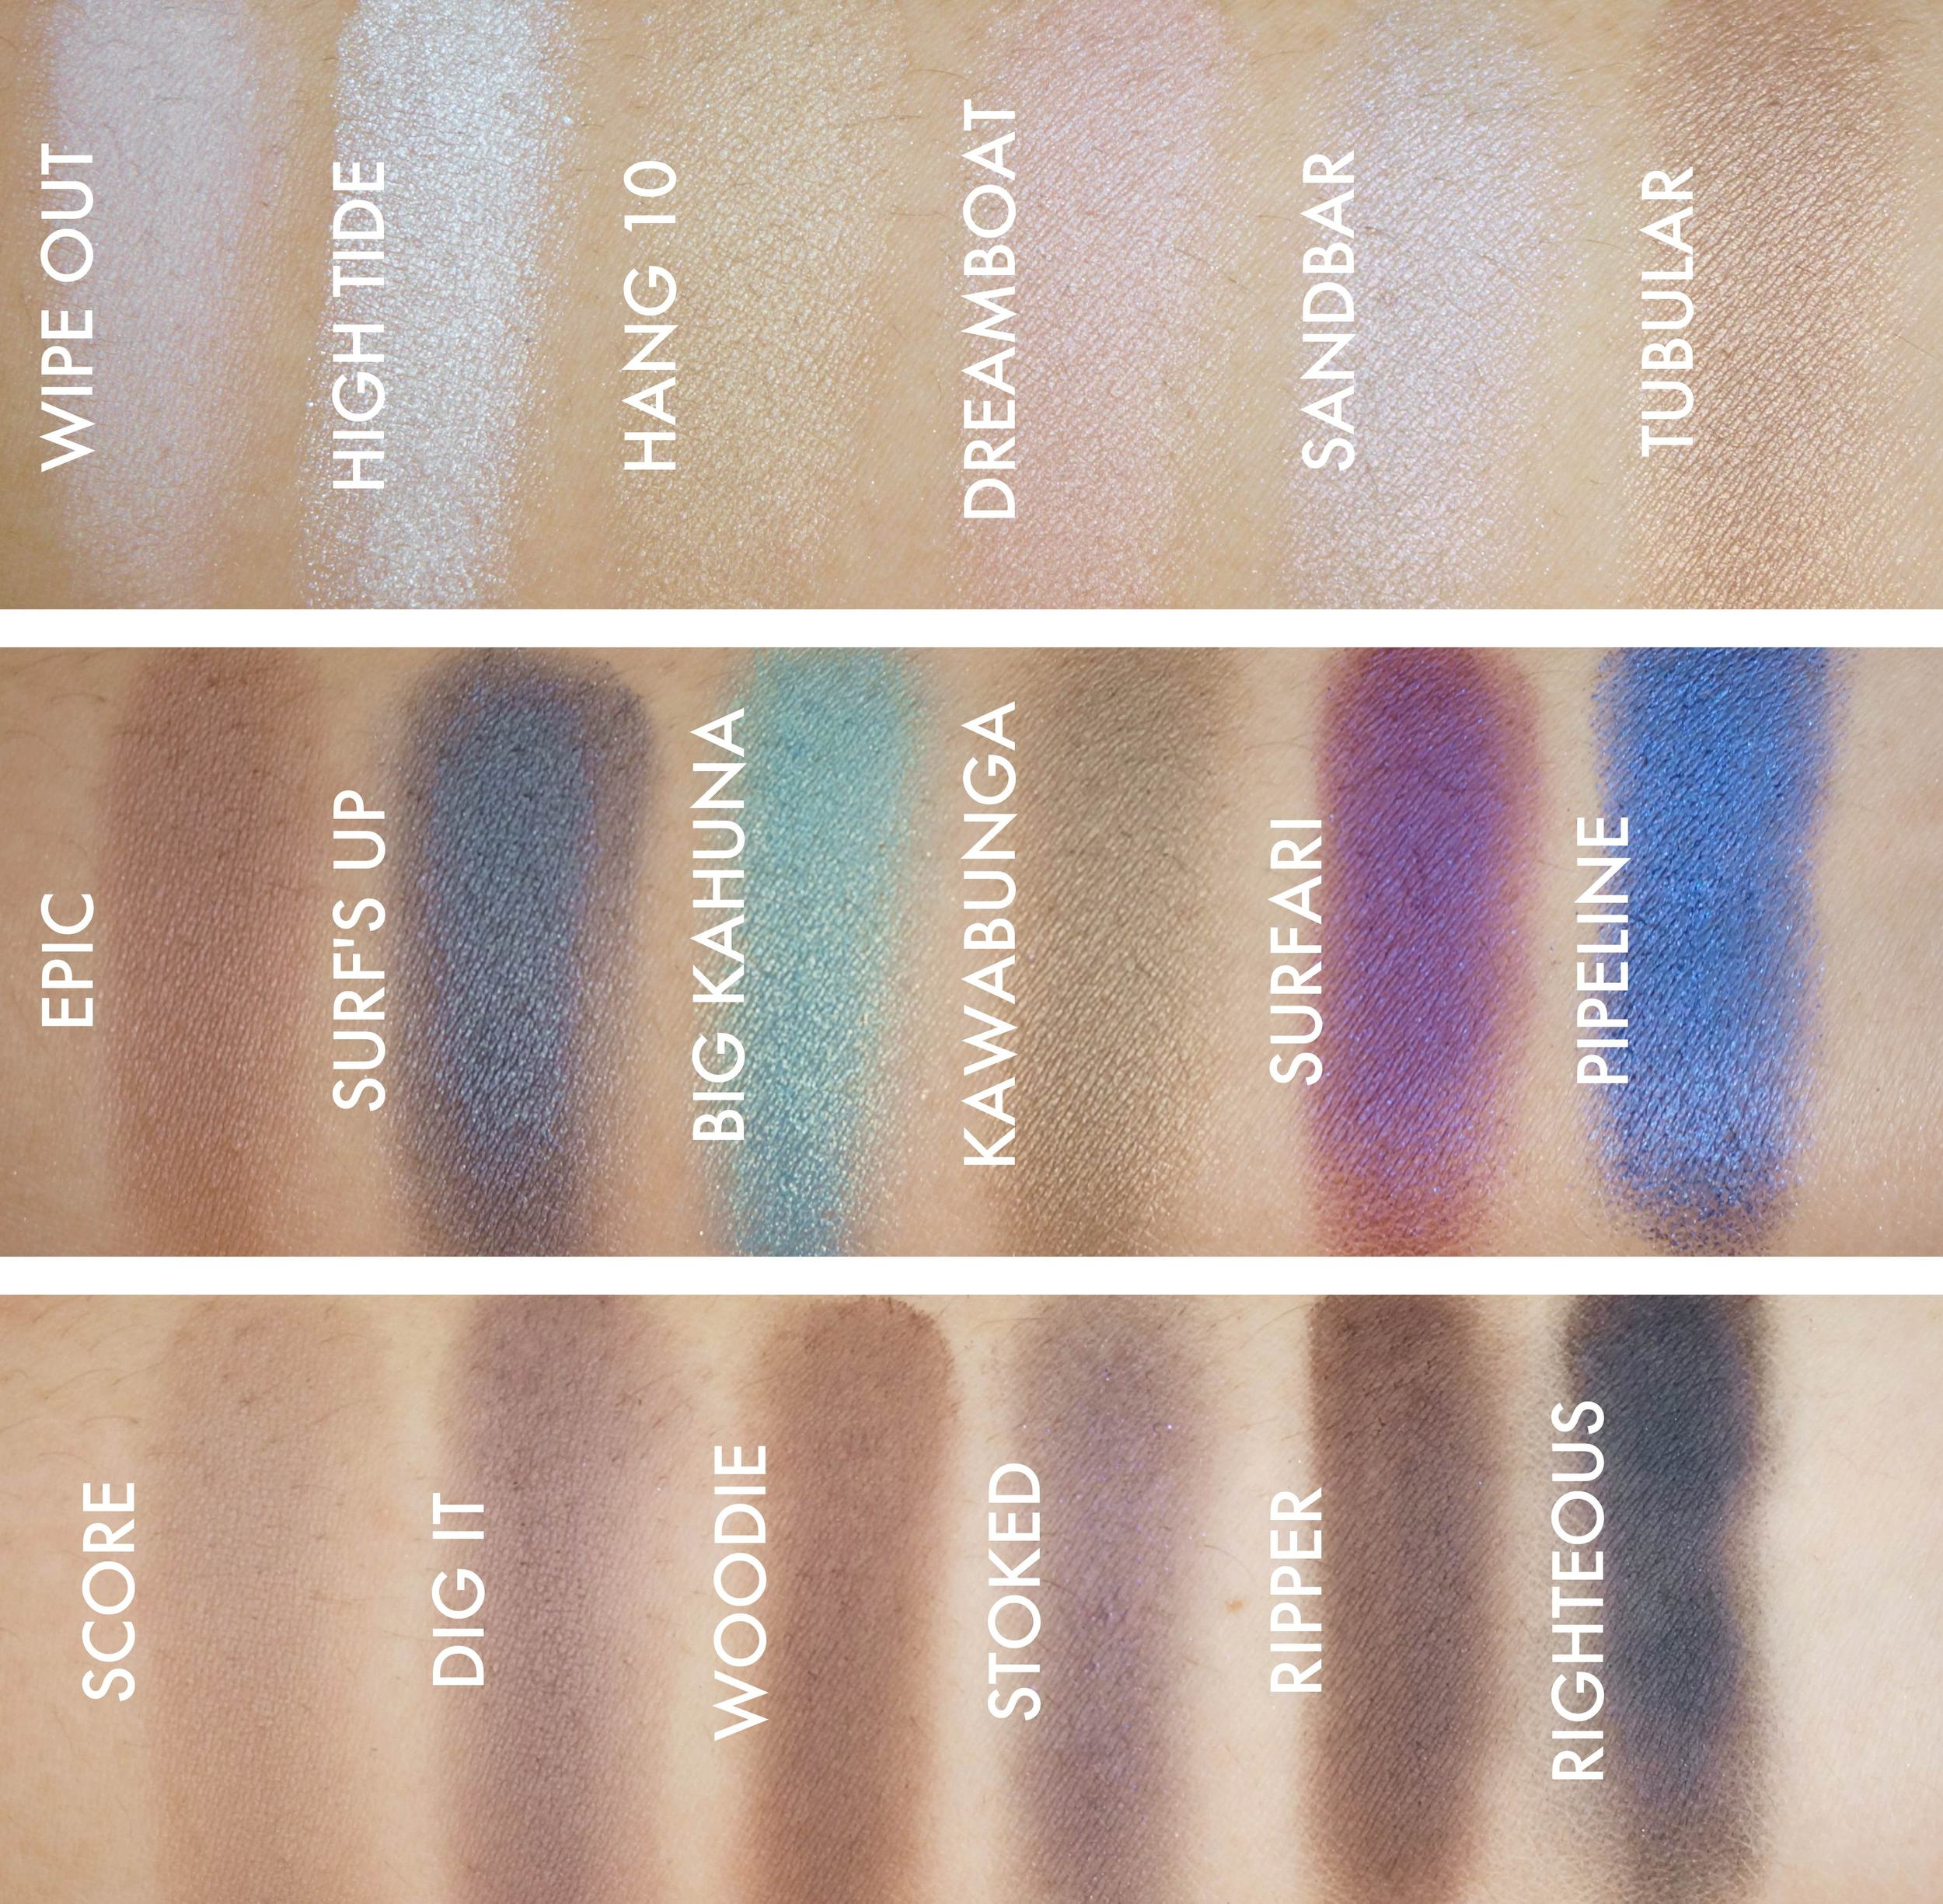 TheBalm Balmsai Palette Swatches.jpg